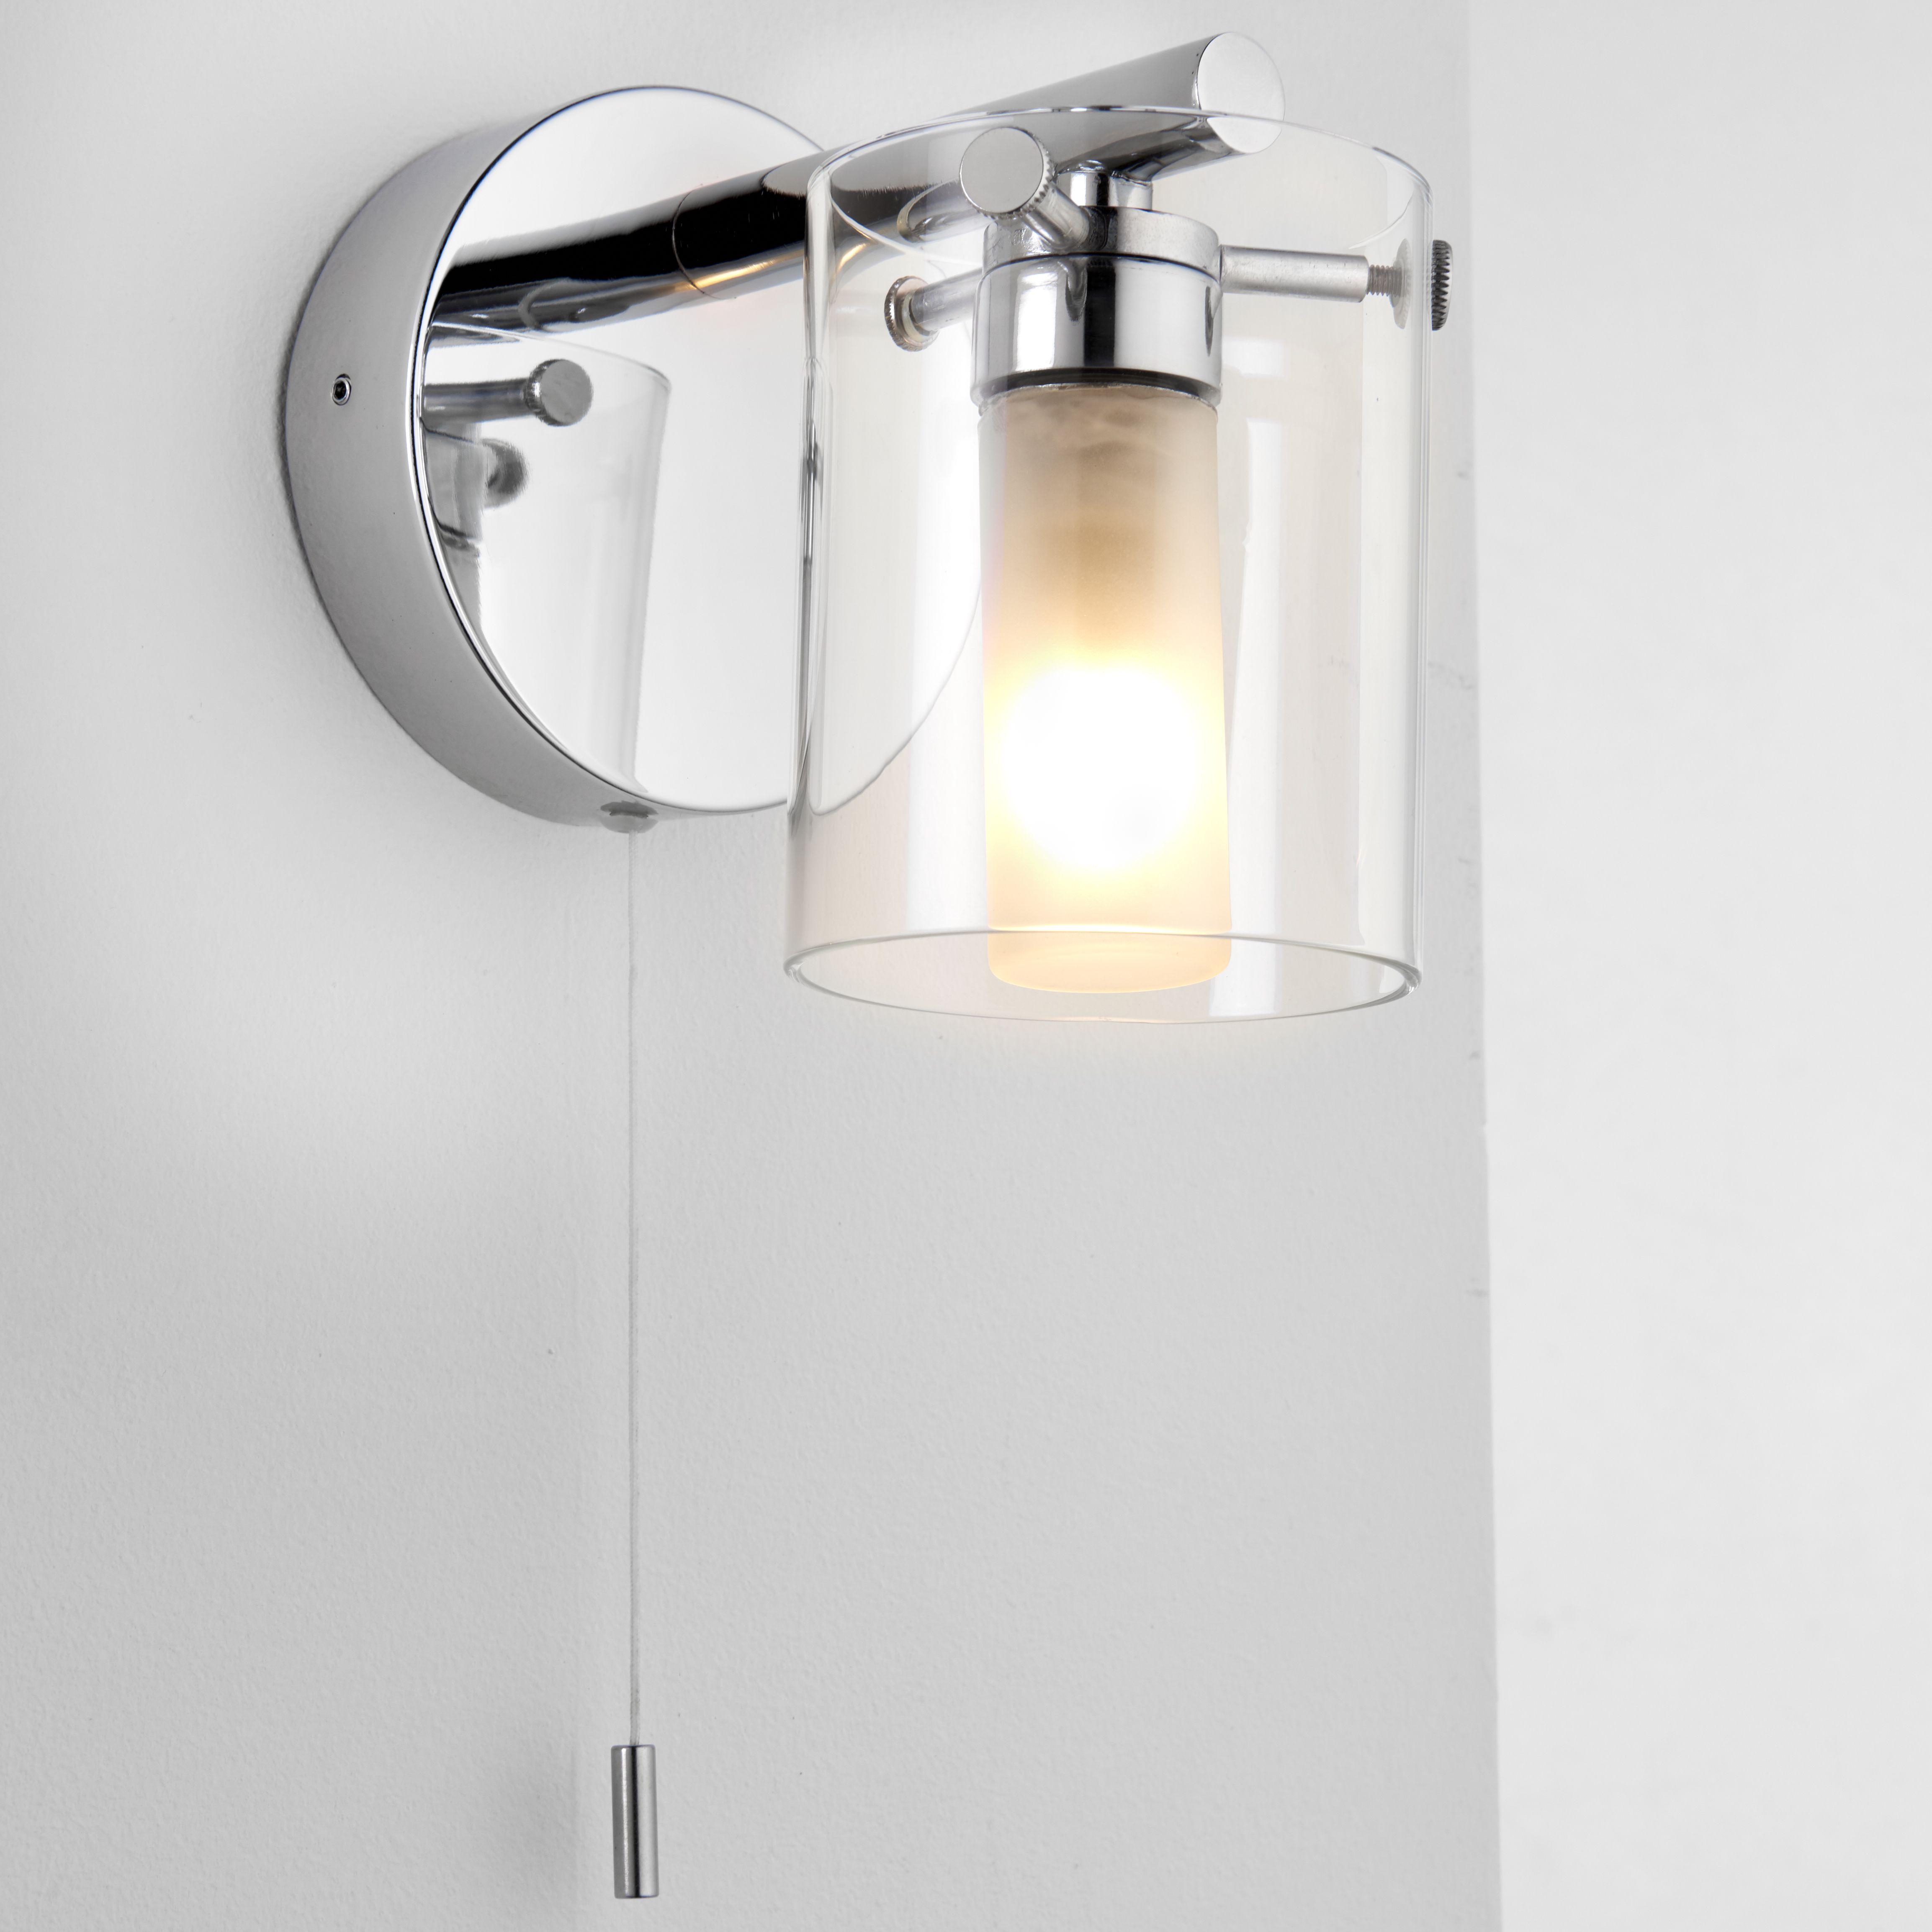 Syren Polished Chrome Effect Bathroom Wall Light Departments Diy At B Q